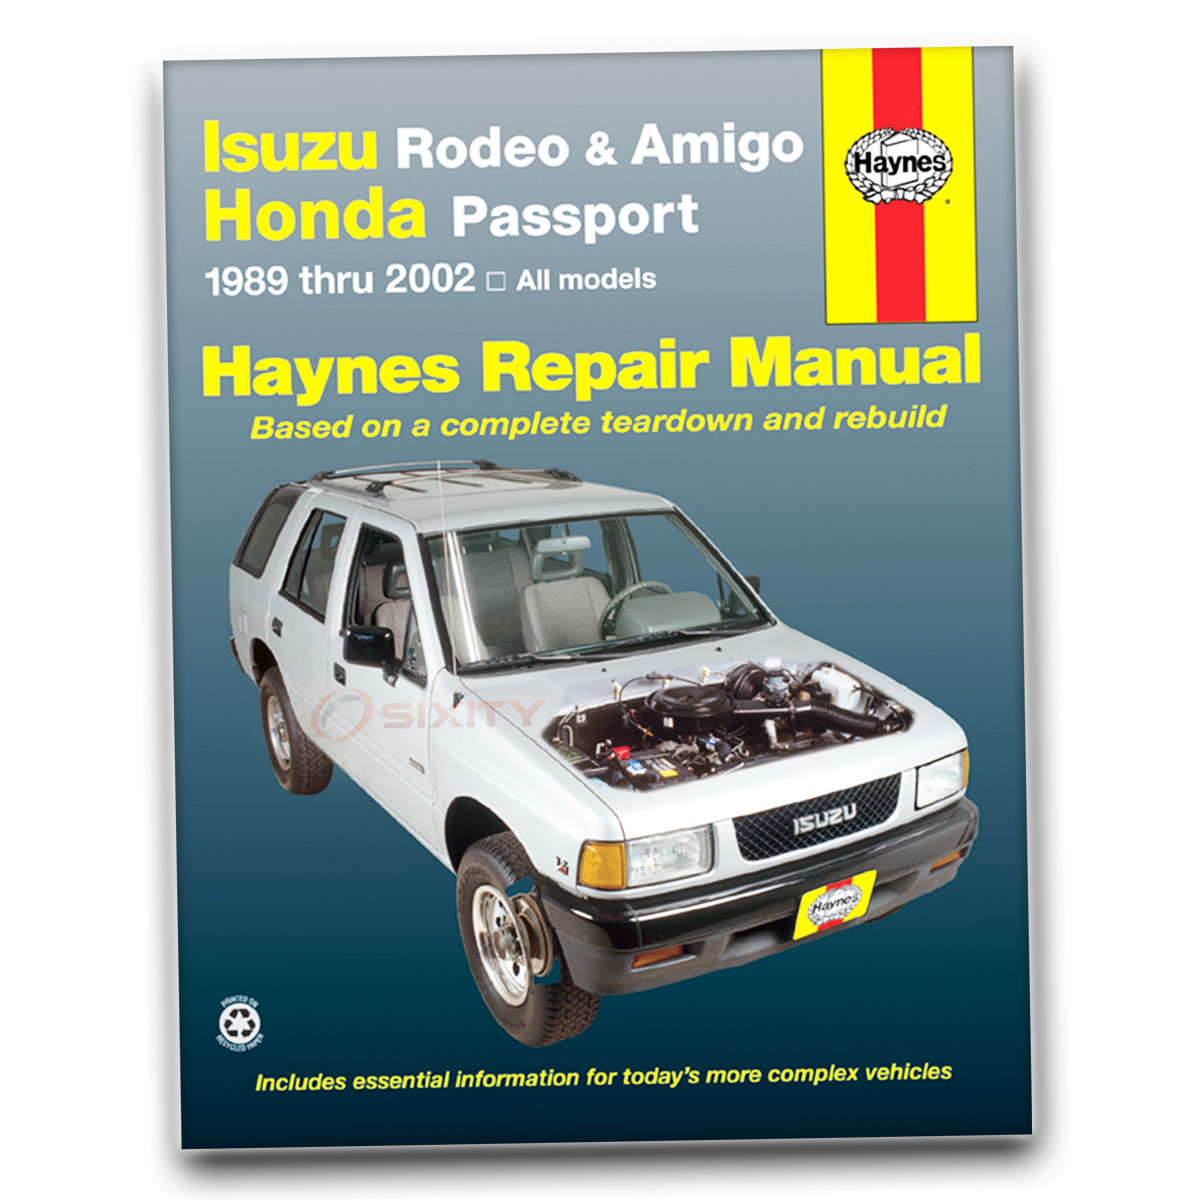 1995 Isuzu Rodeo Repair Various Owner Manual Guide 1996 Starter Location Honda Passport How To And User Instructions U2022 Rh Taxibermuda Co Service Workshop Manualpdf